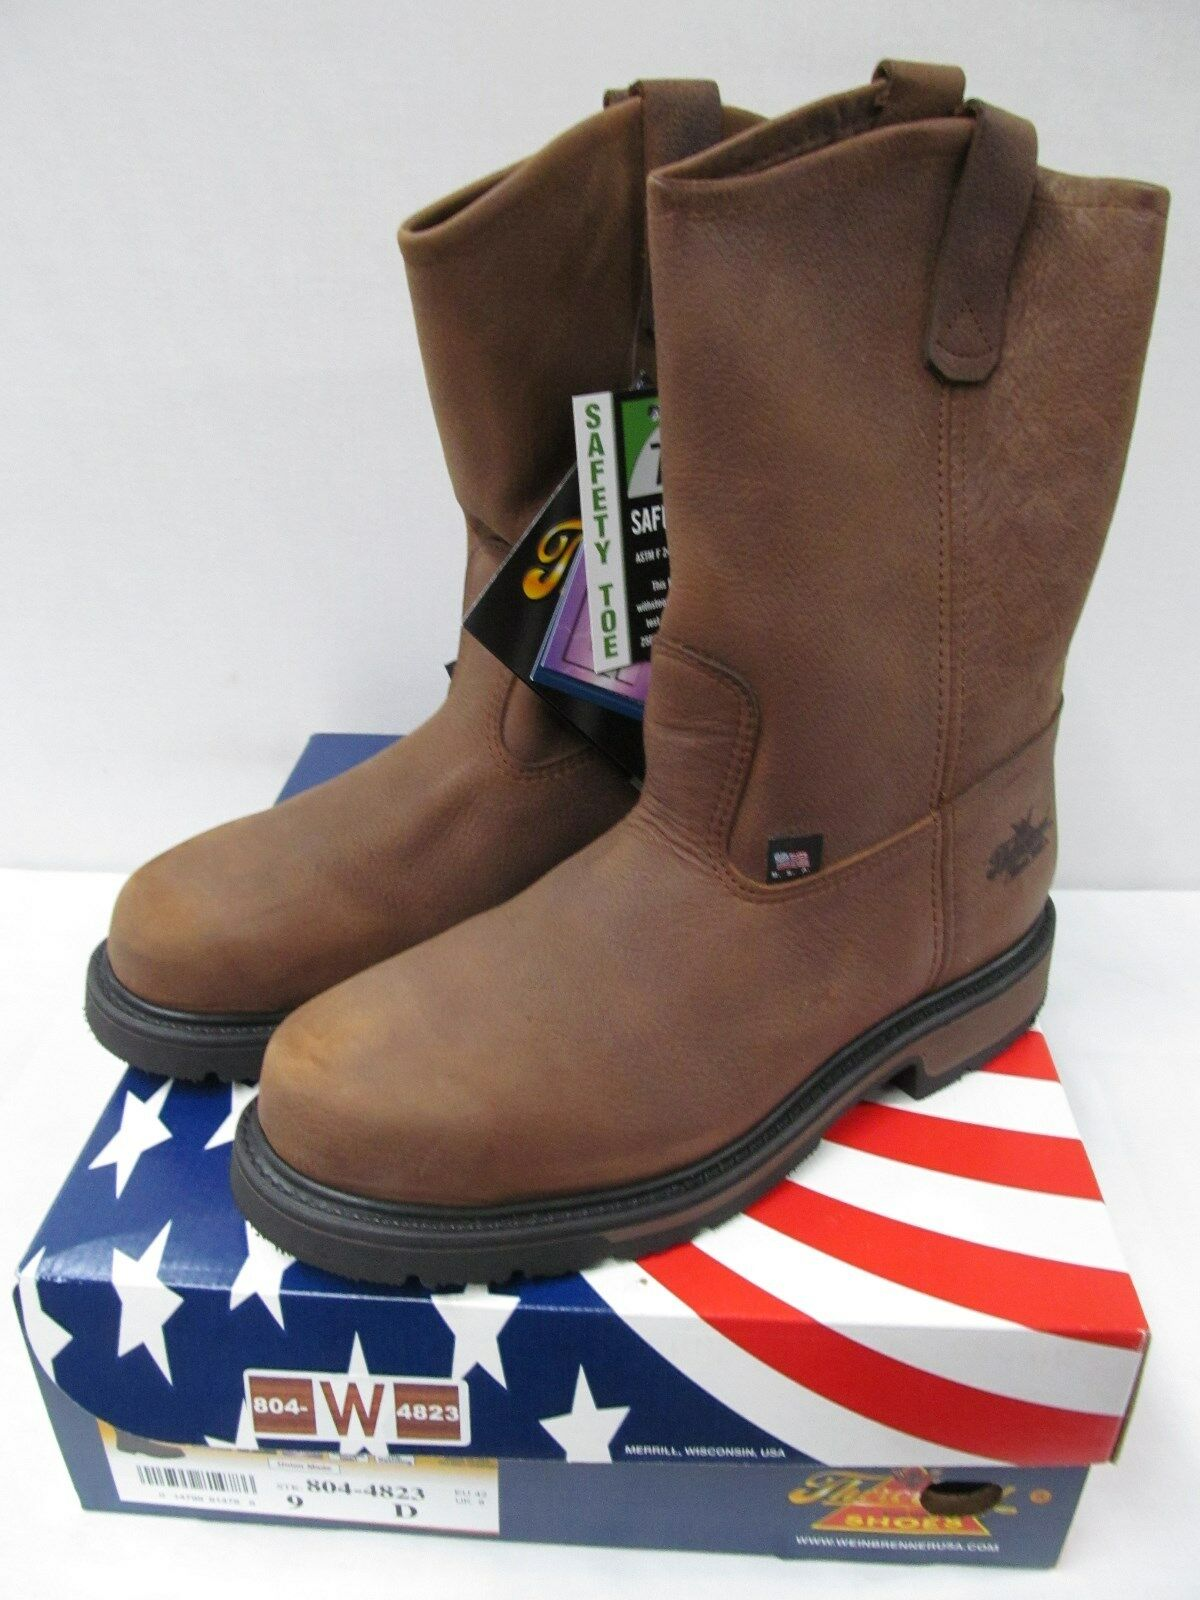 Thgoldgood Work Boots Mens Wellington Oil Rig Steel Toe Brown 804-4823